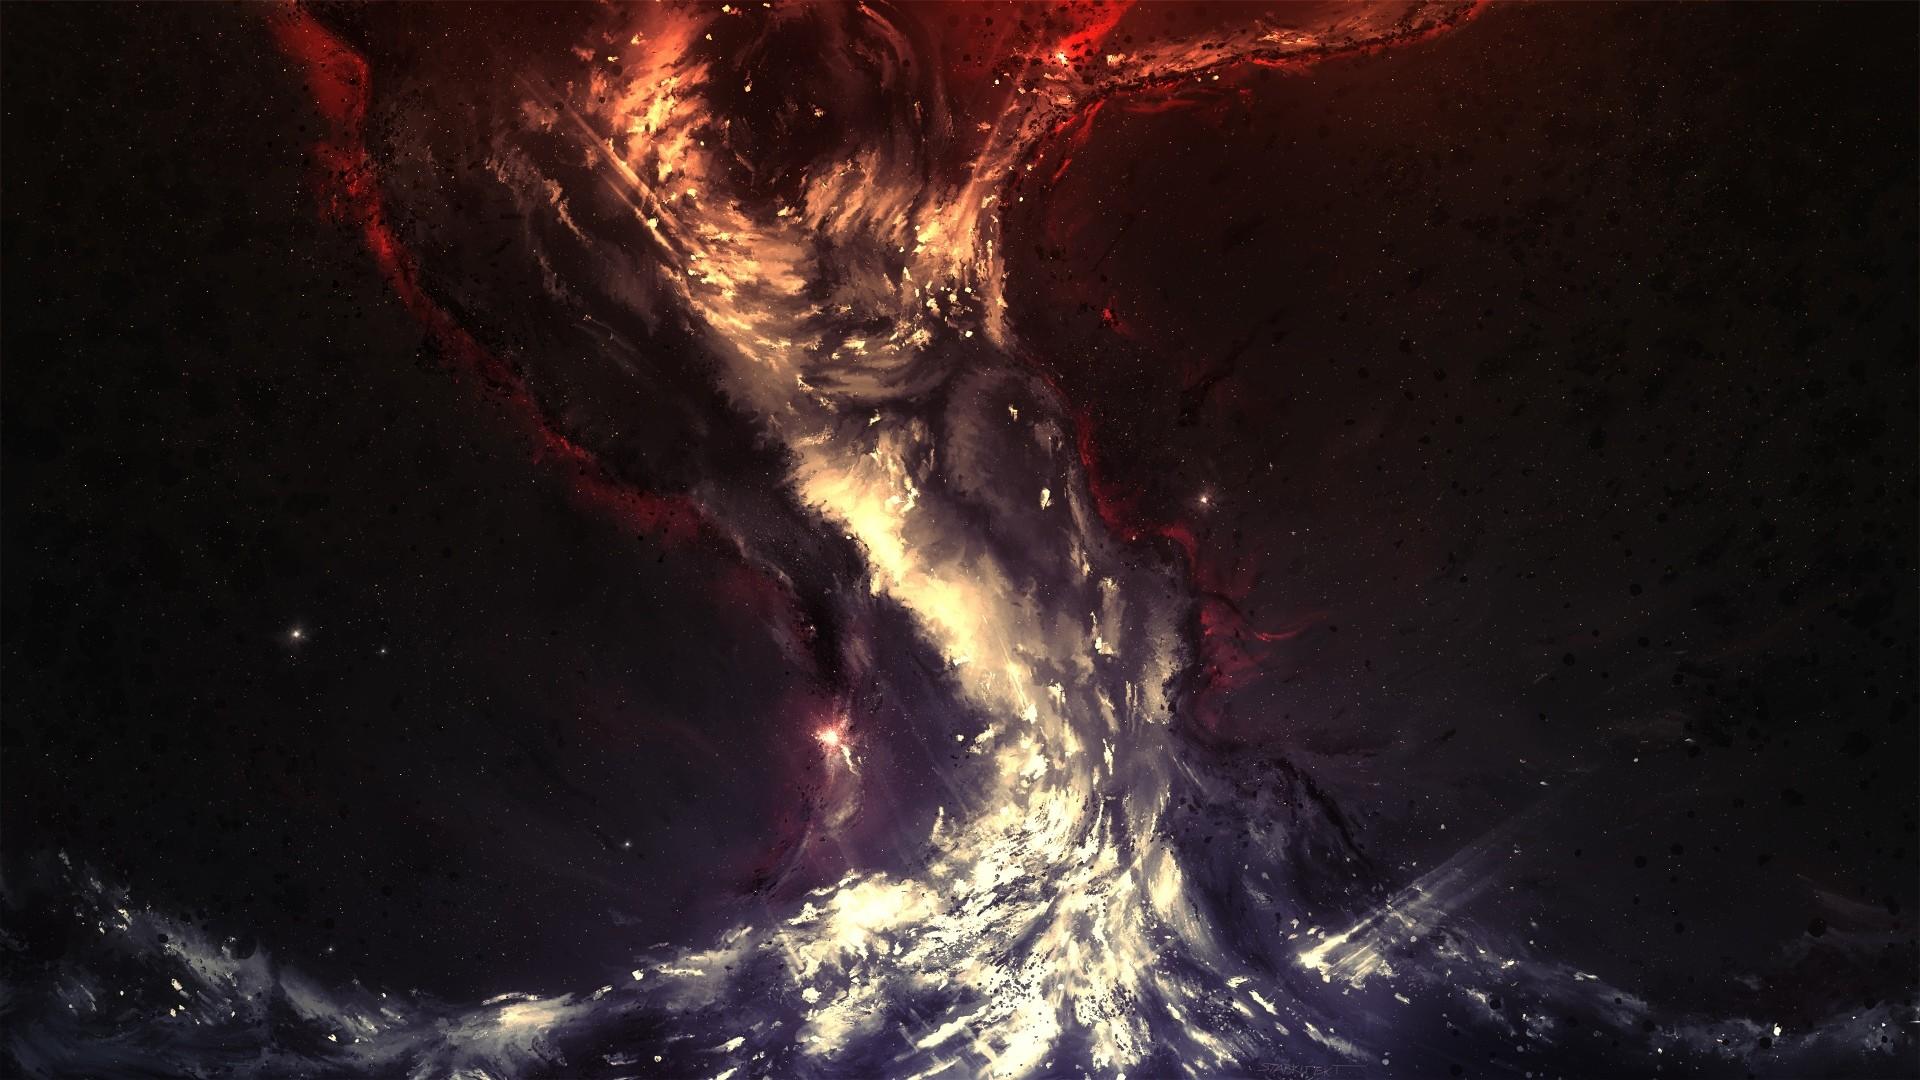 … Background Full HD 1080p. Wallpaper space, art, universe